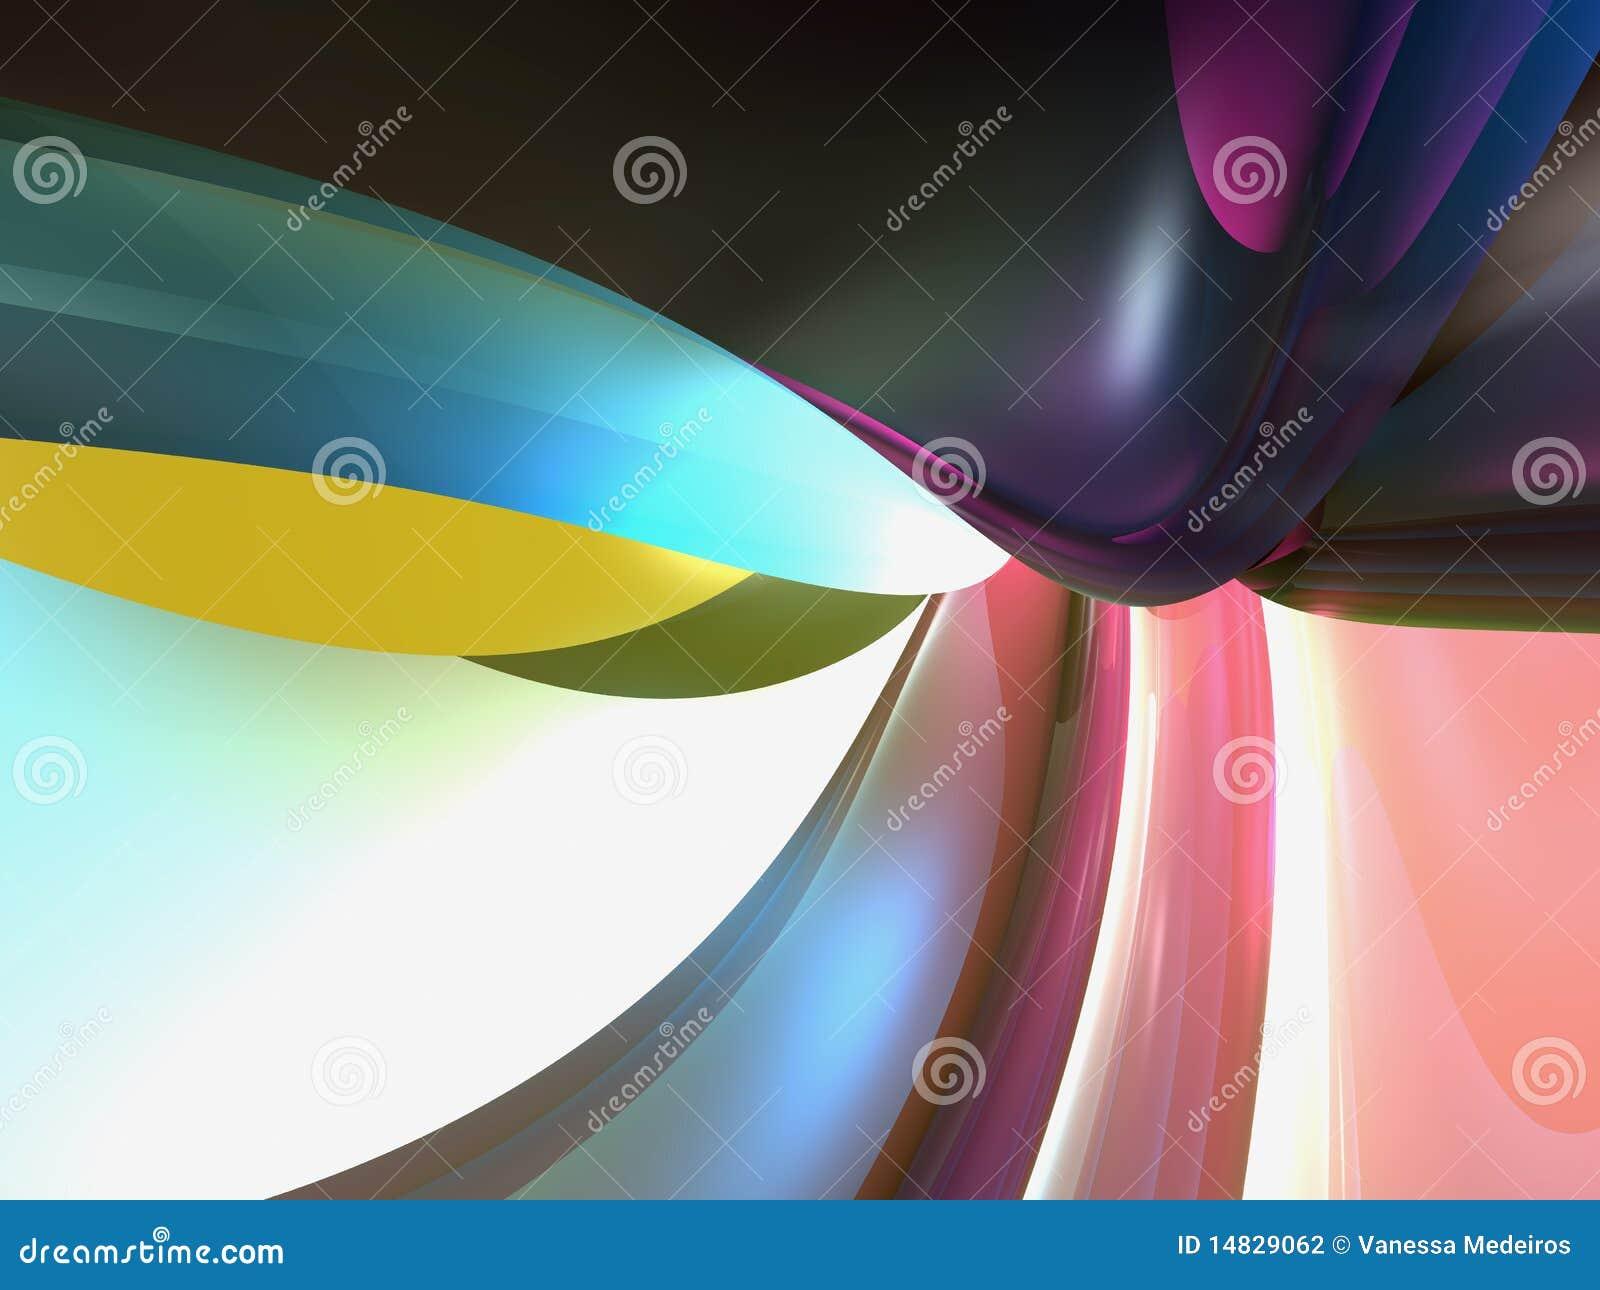 Esporte Tileable Papel De Parede Colorido: Papel De Parede Abstrato Colorido Do Fundo Ilustração